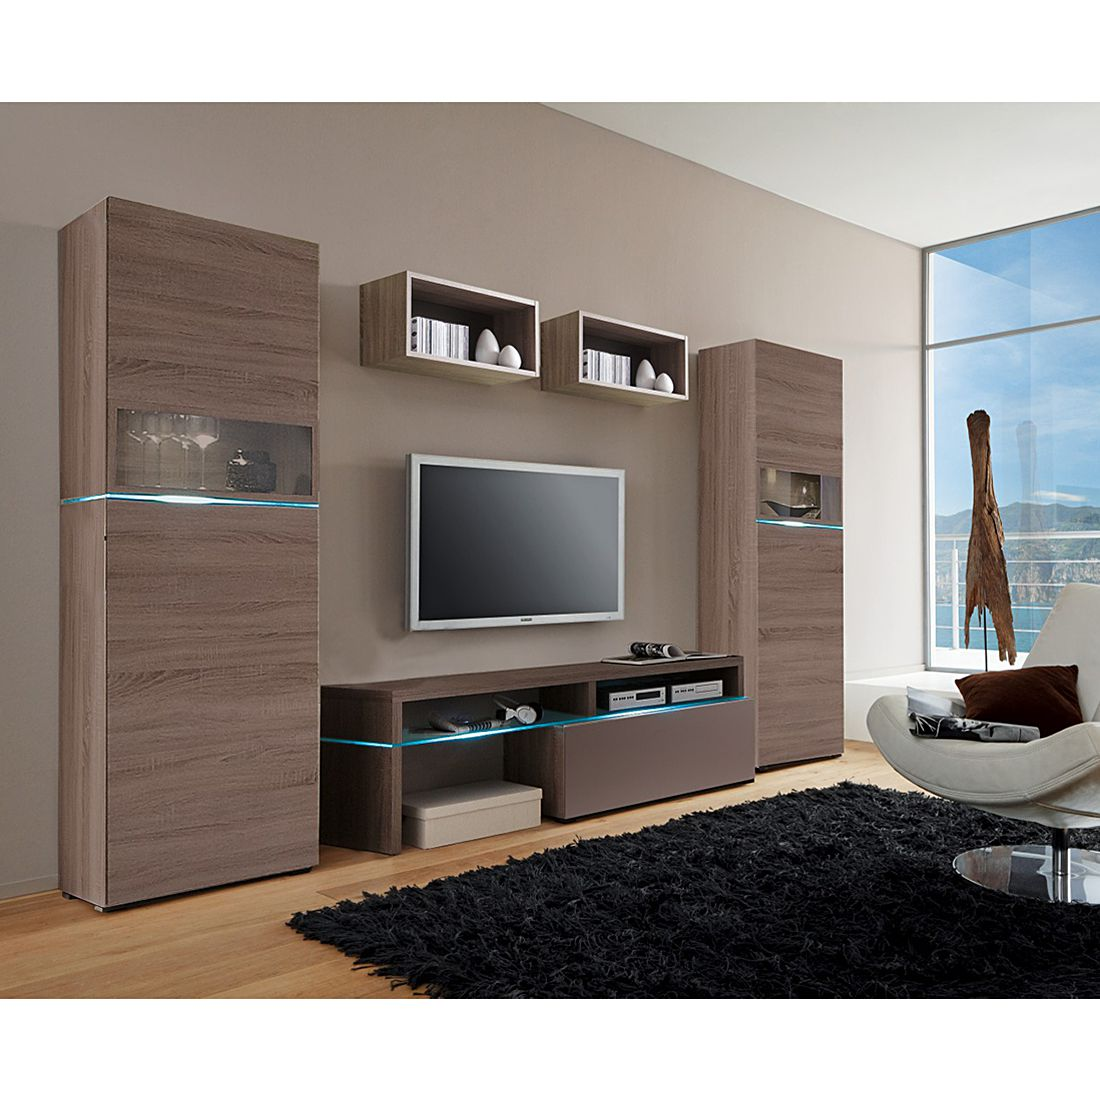 wohnwand colourart 5 teilig eiche sonoma tr ffel. Black Bedroom Furniture Sets. Home Design Ideas